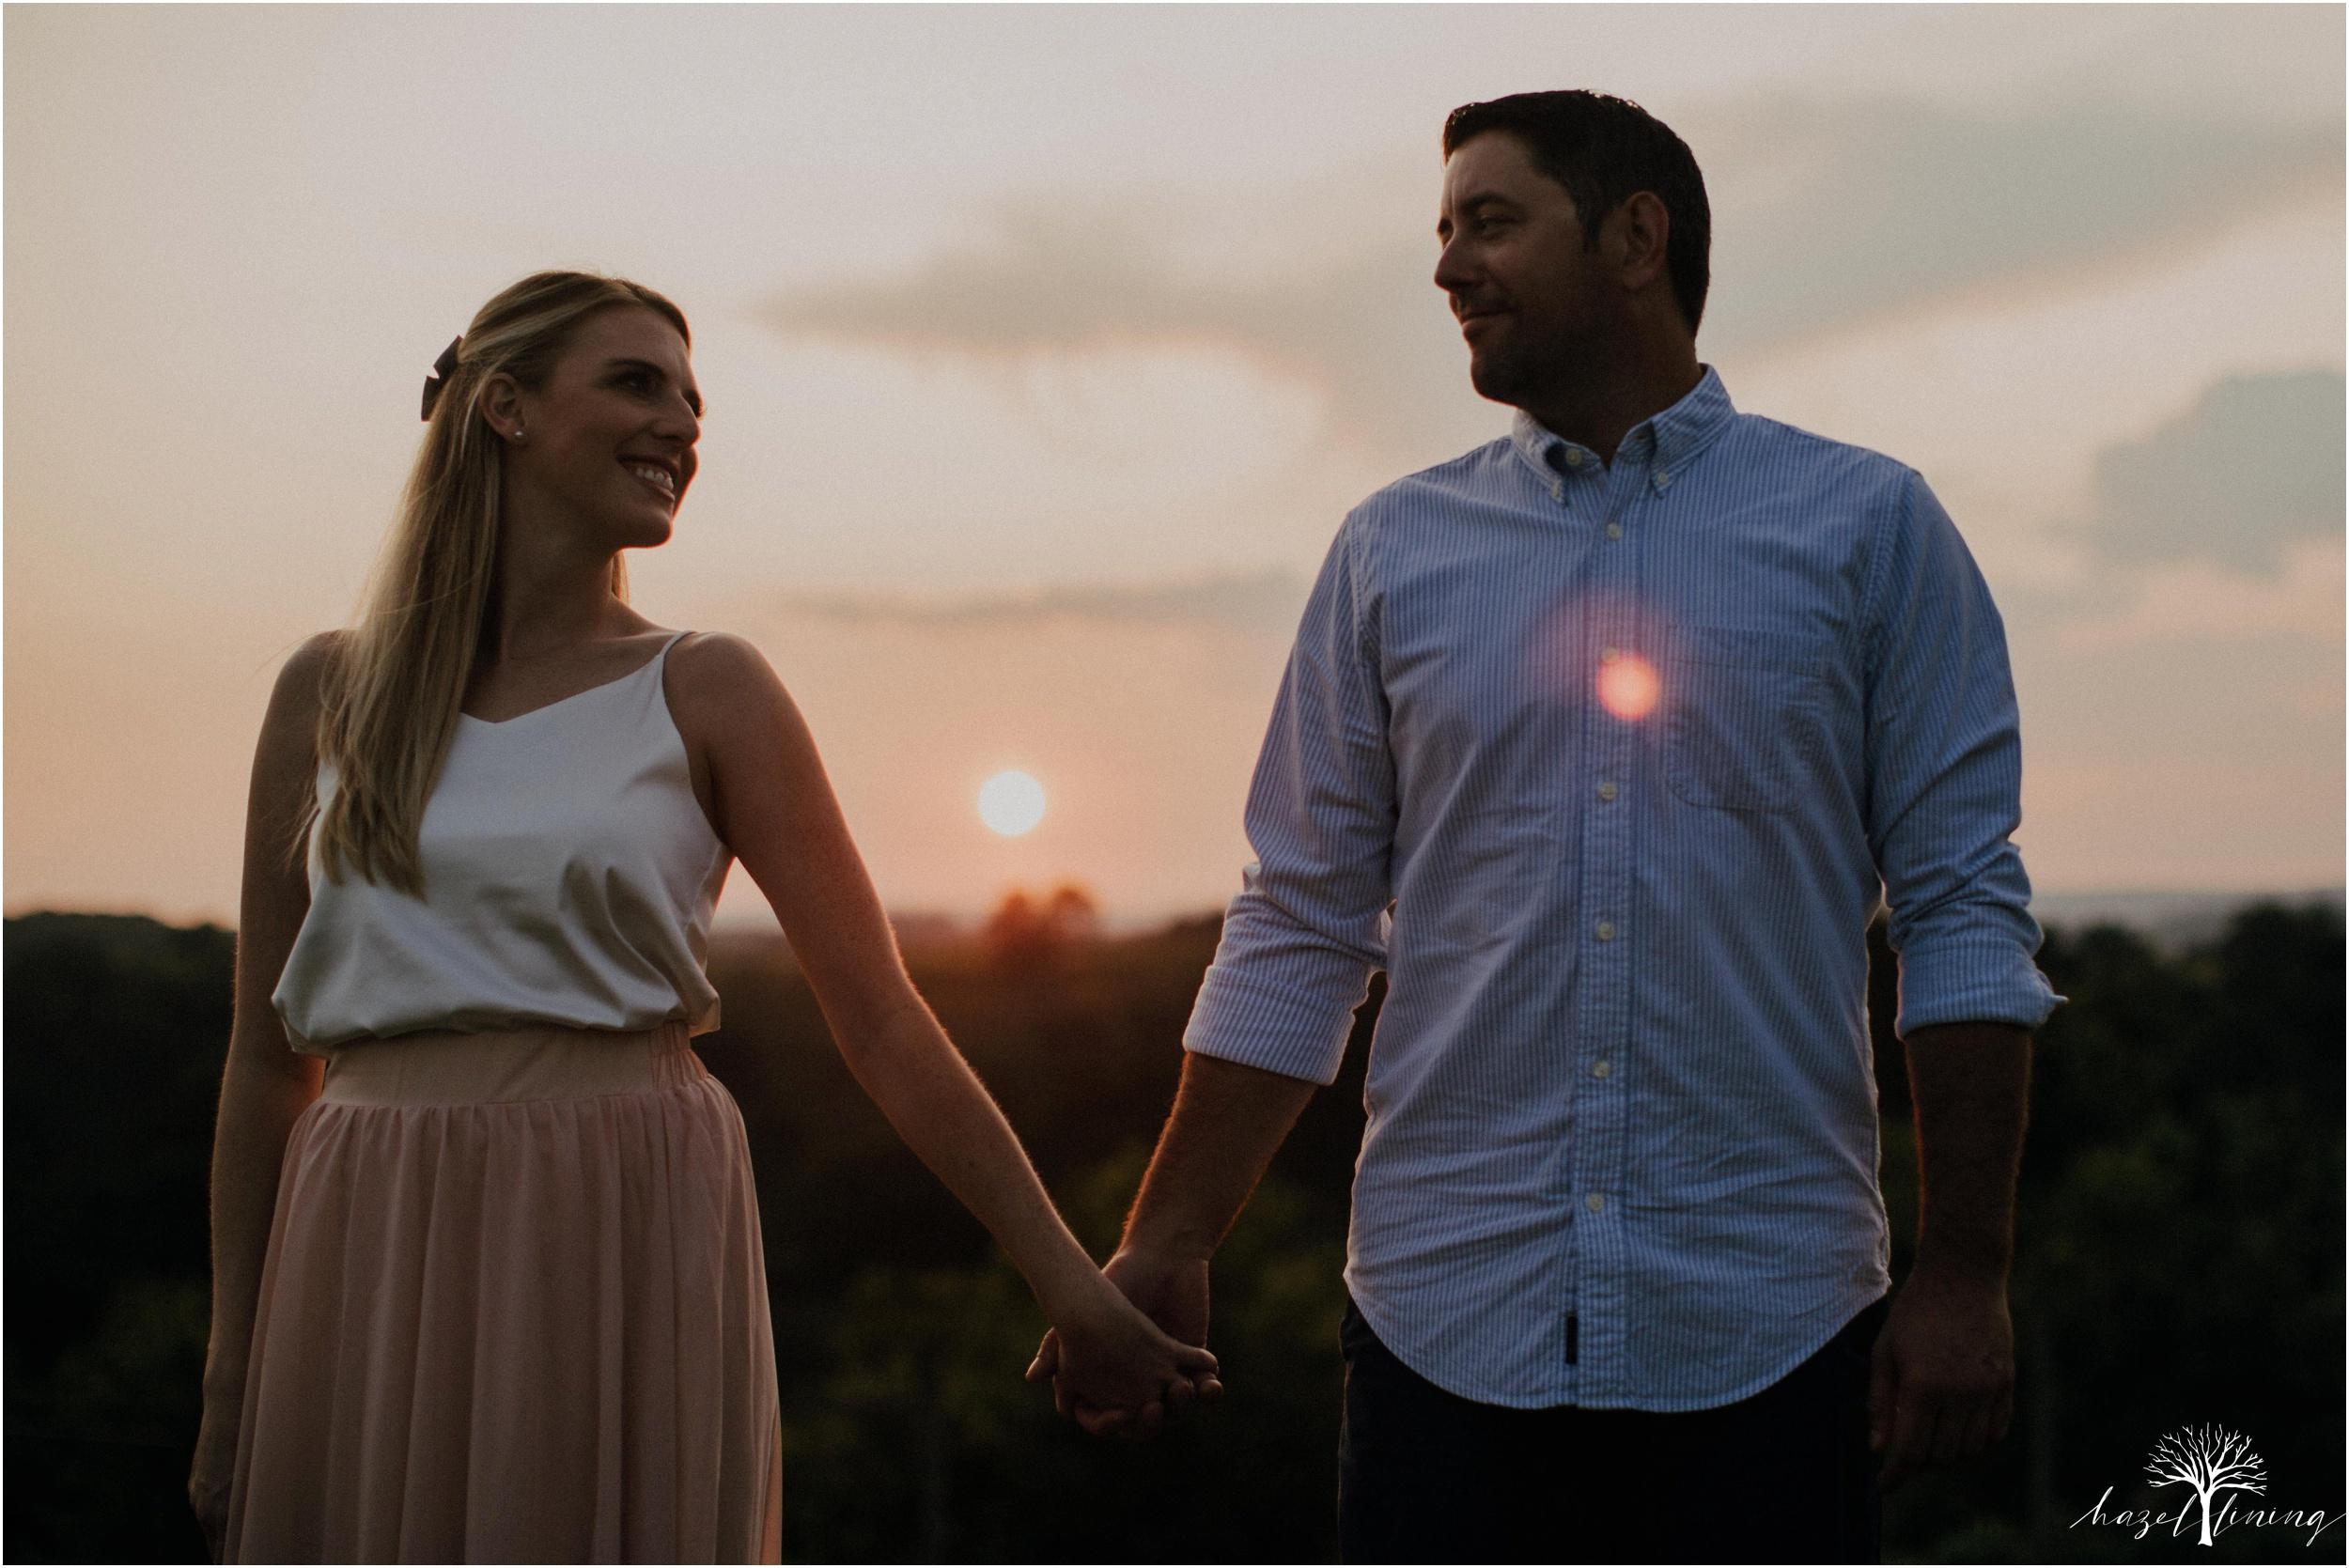 ashley-fillmore-steve-reimer-trexler-nature-preserve-summer-engagement-session-schnecksville-pennsylvania-hazel-lining-photography-destination-elopement-wedding-engagement-photography_0063.jpg